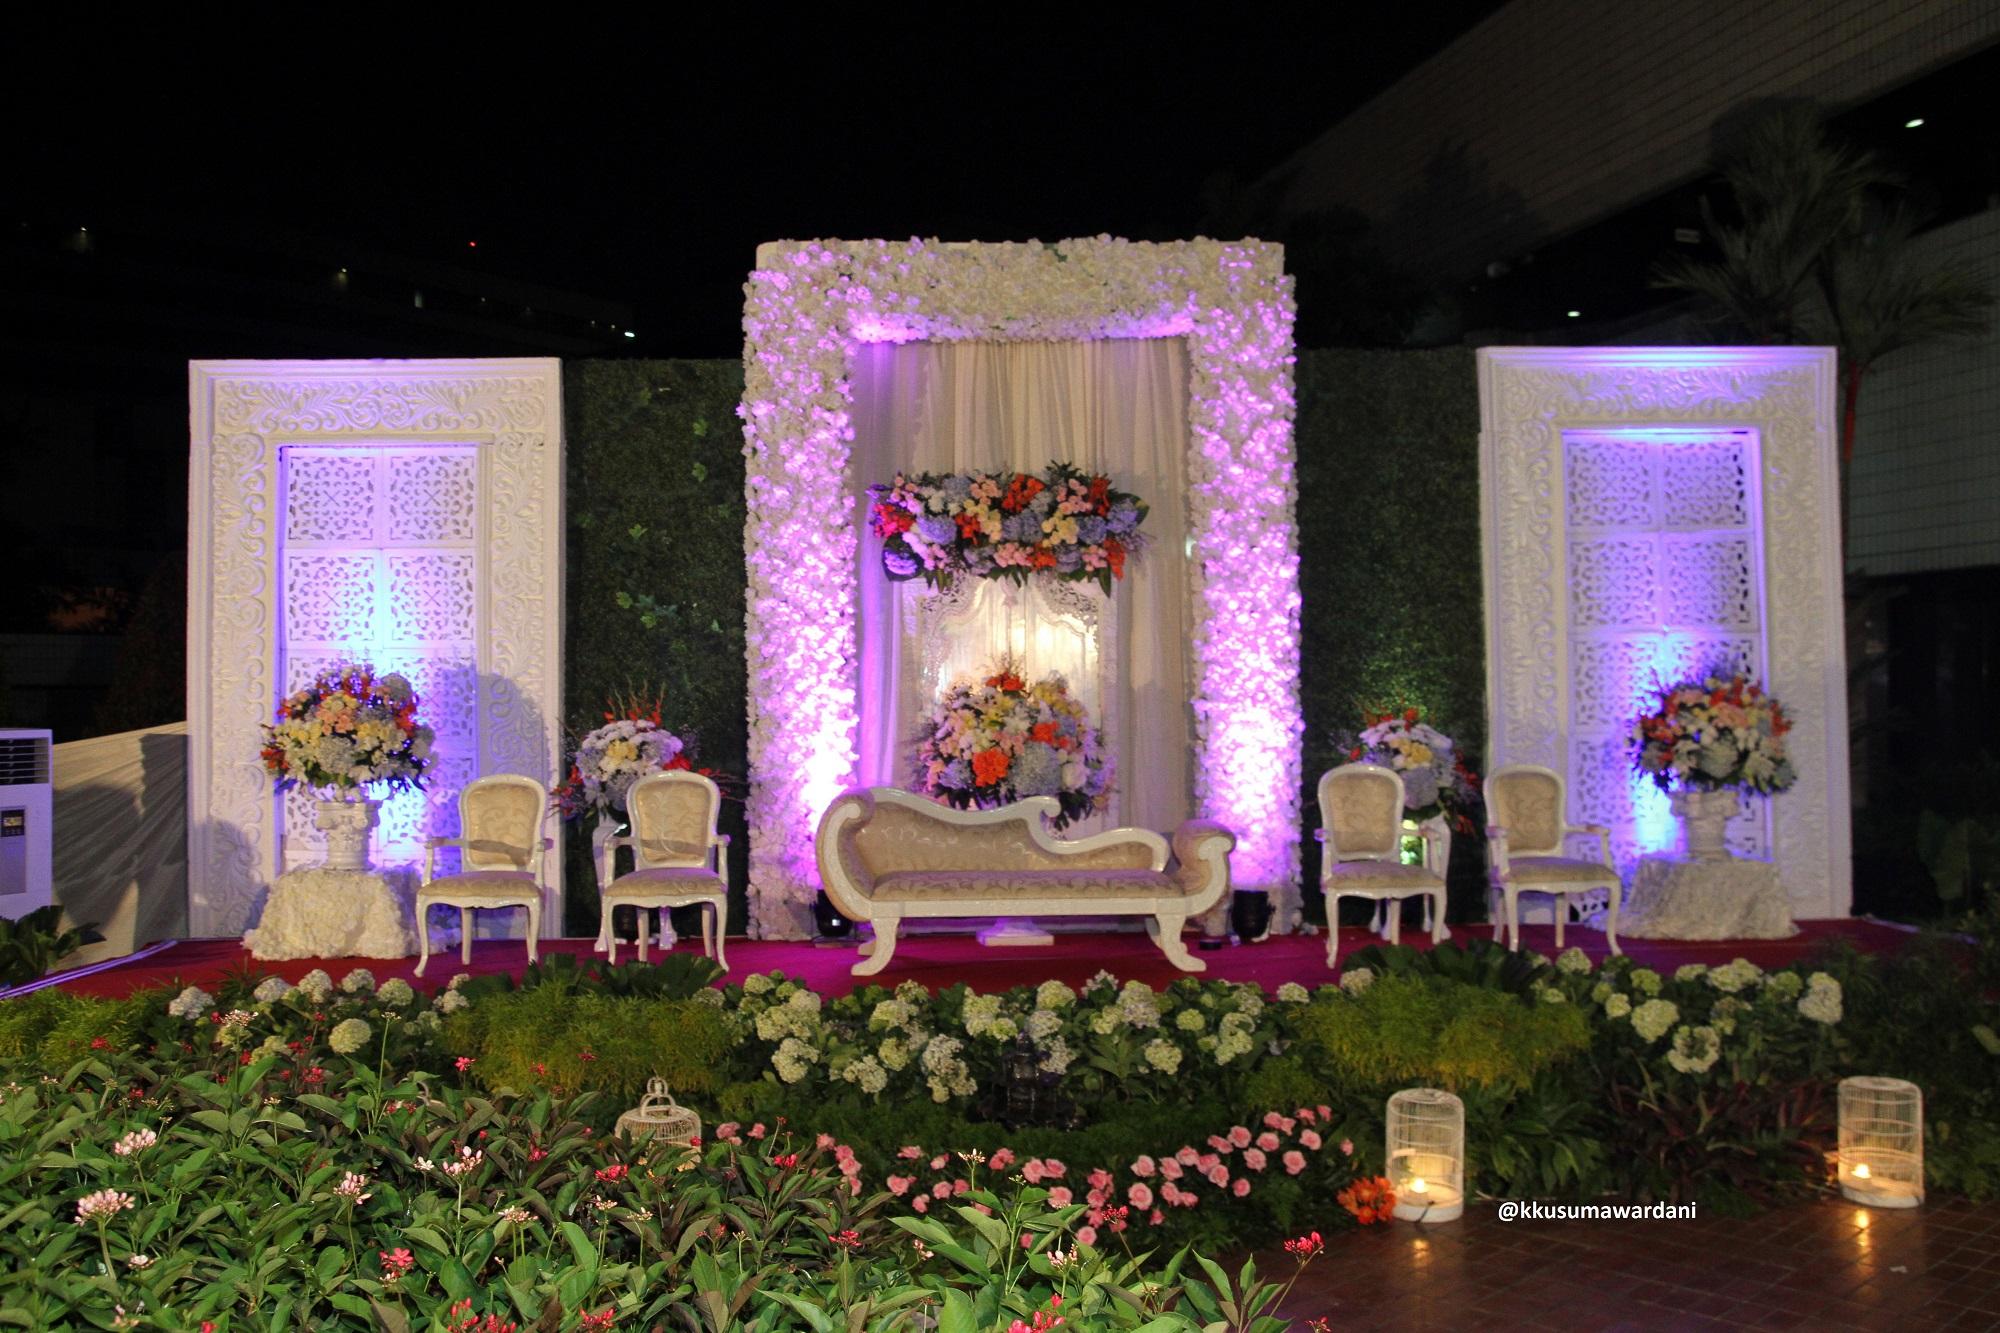 New outdoor wedding stage decoration photos wedding wedding decoration stage choice image wedding decoration ideas mwangi dekor junglespirit Choice Image